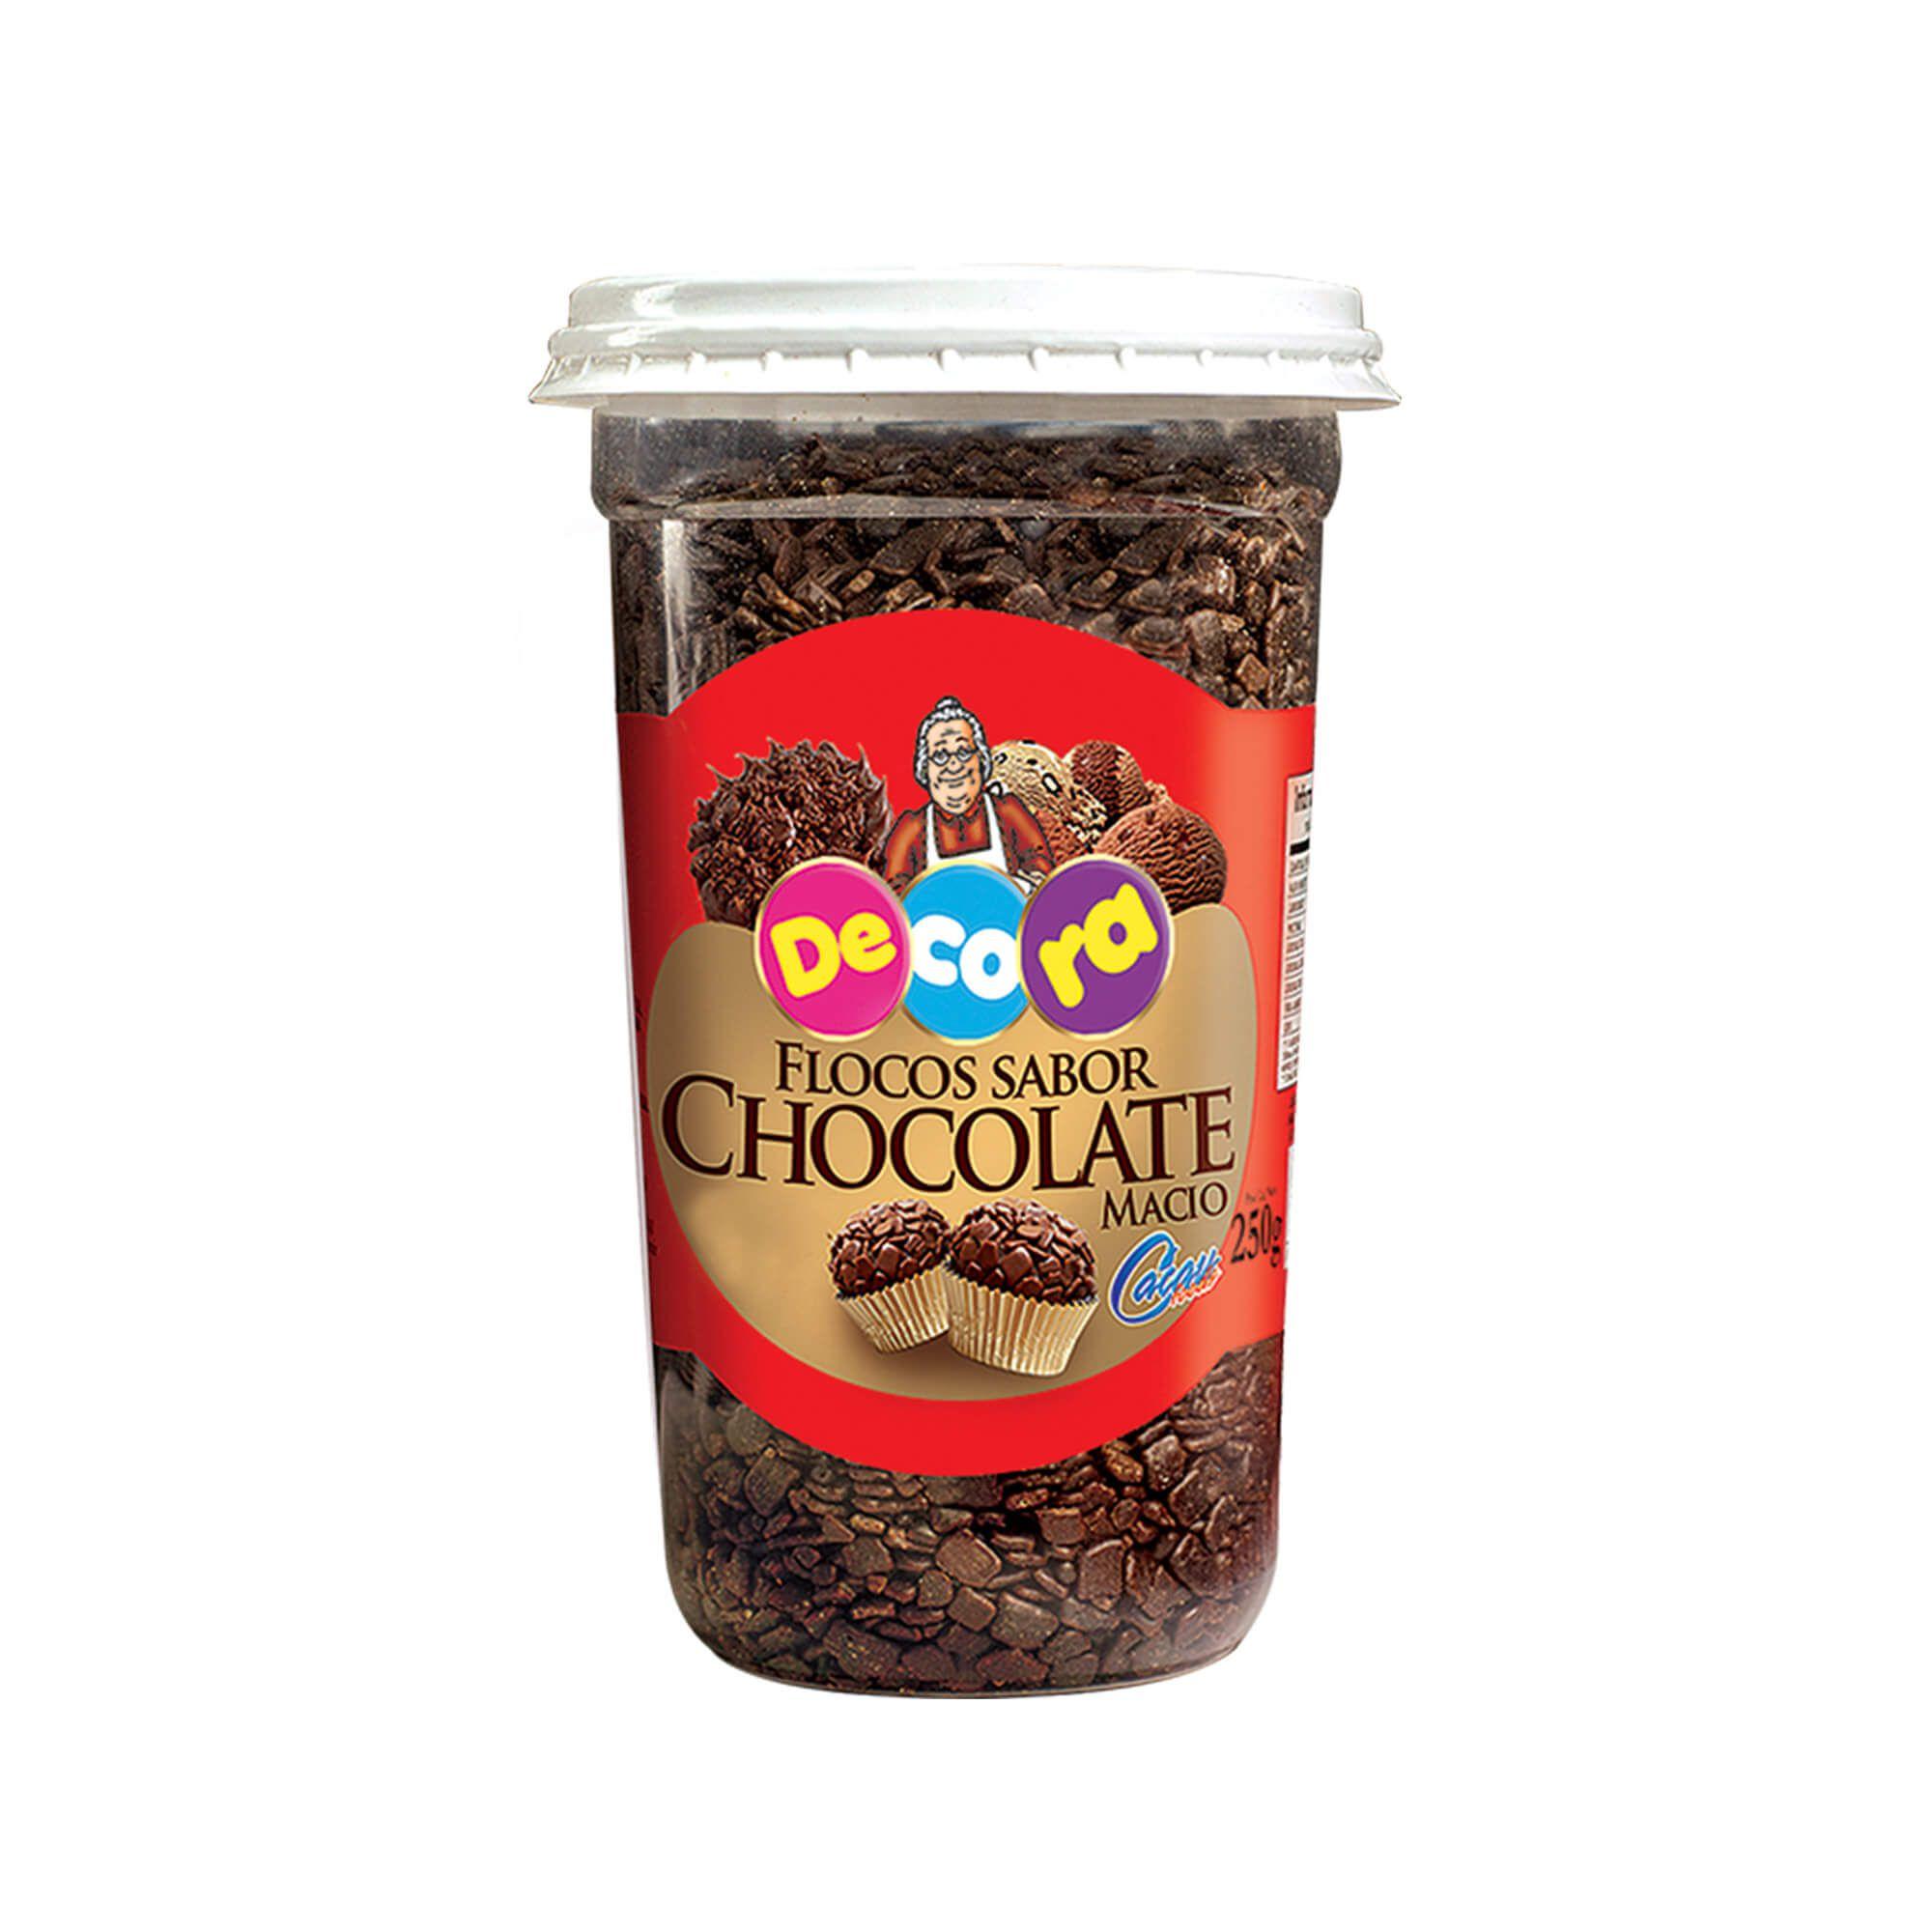 Flocos Sabor Chocolate Macio Decora Copo 250G